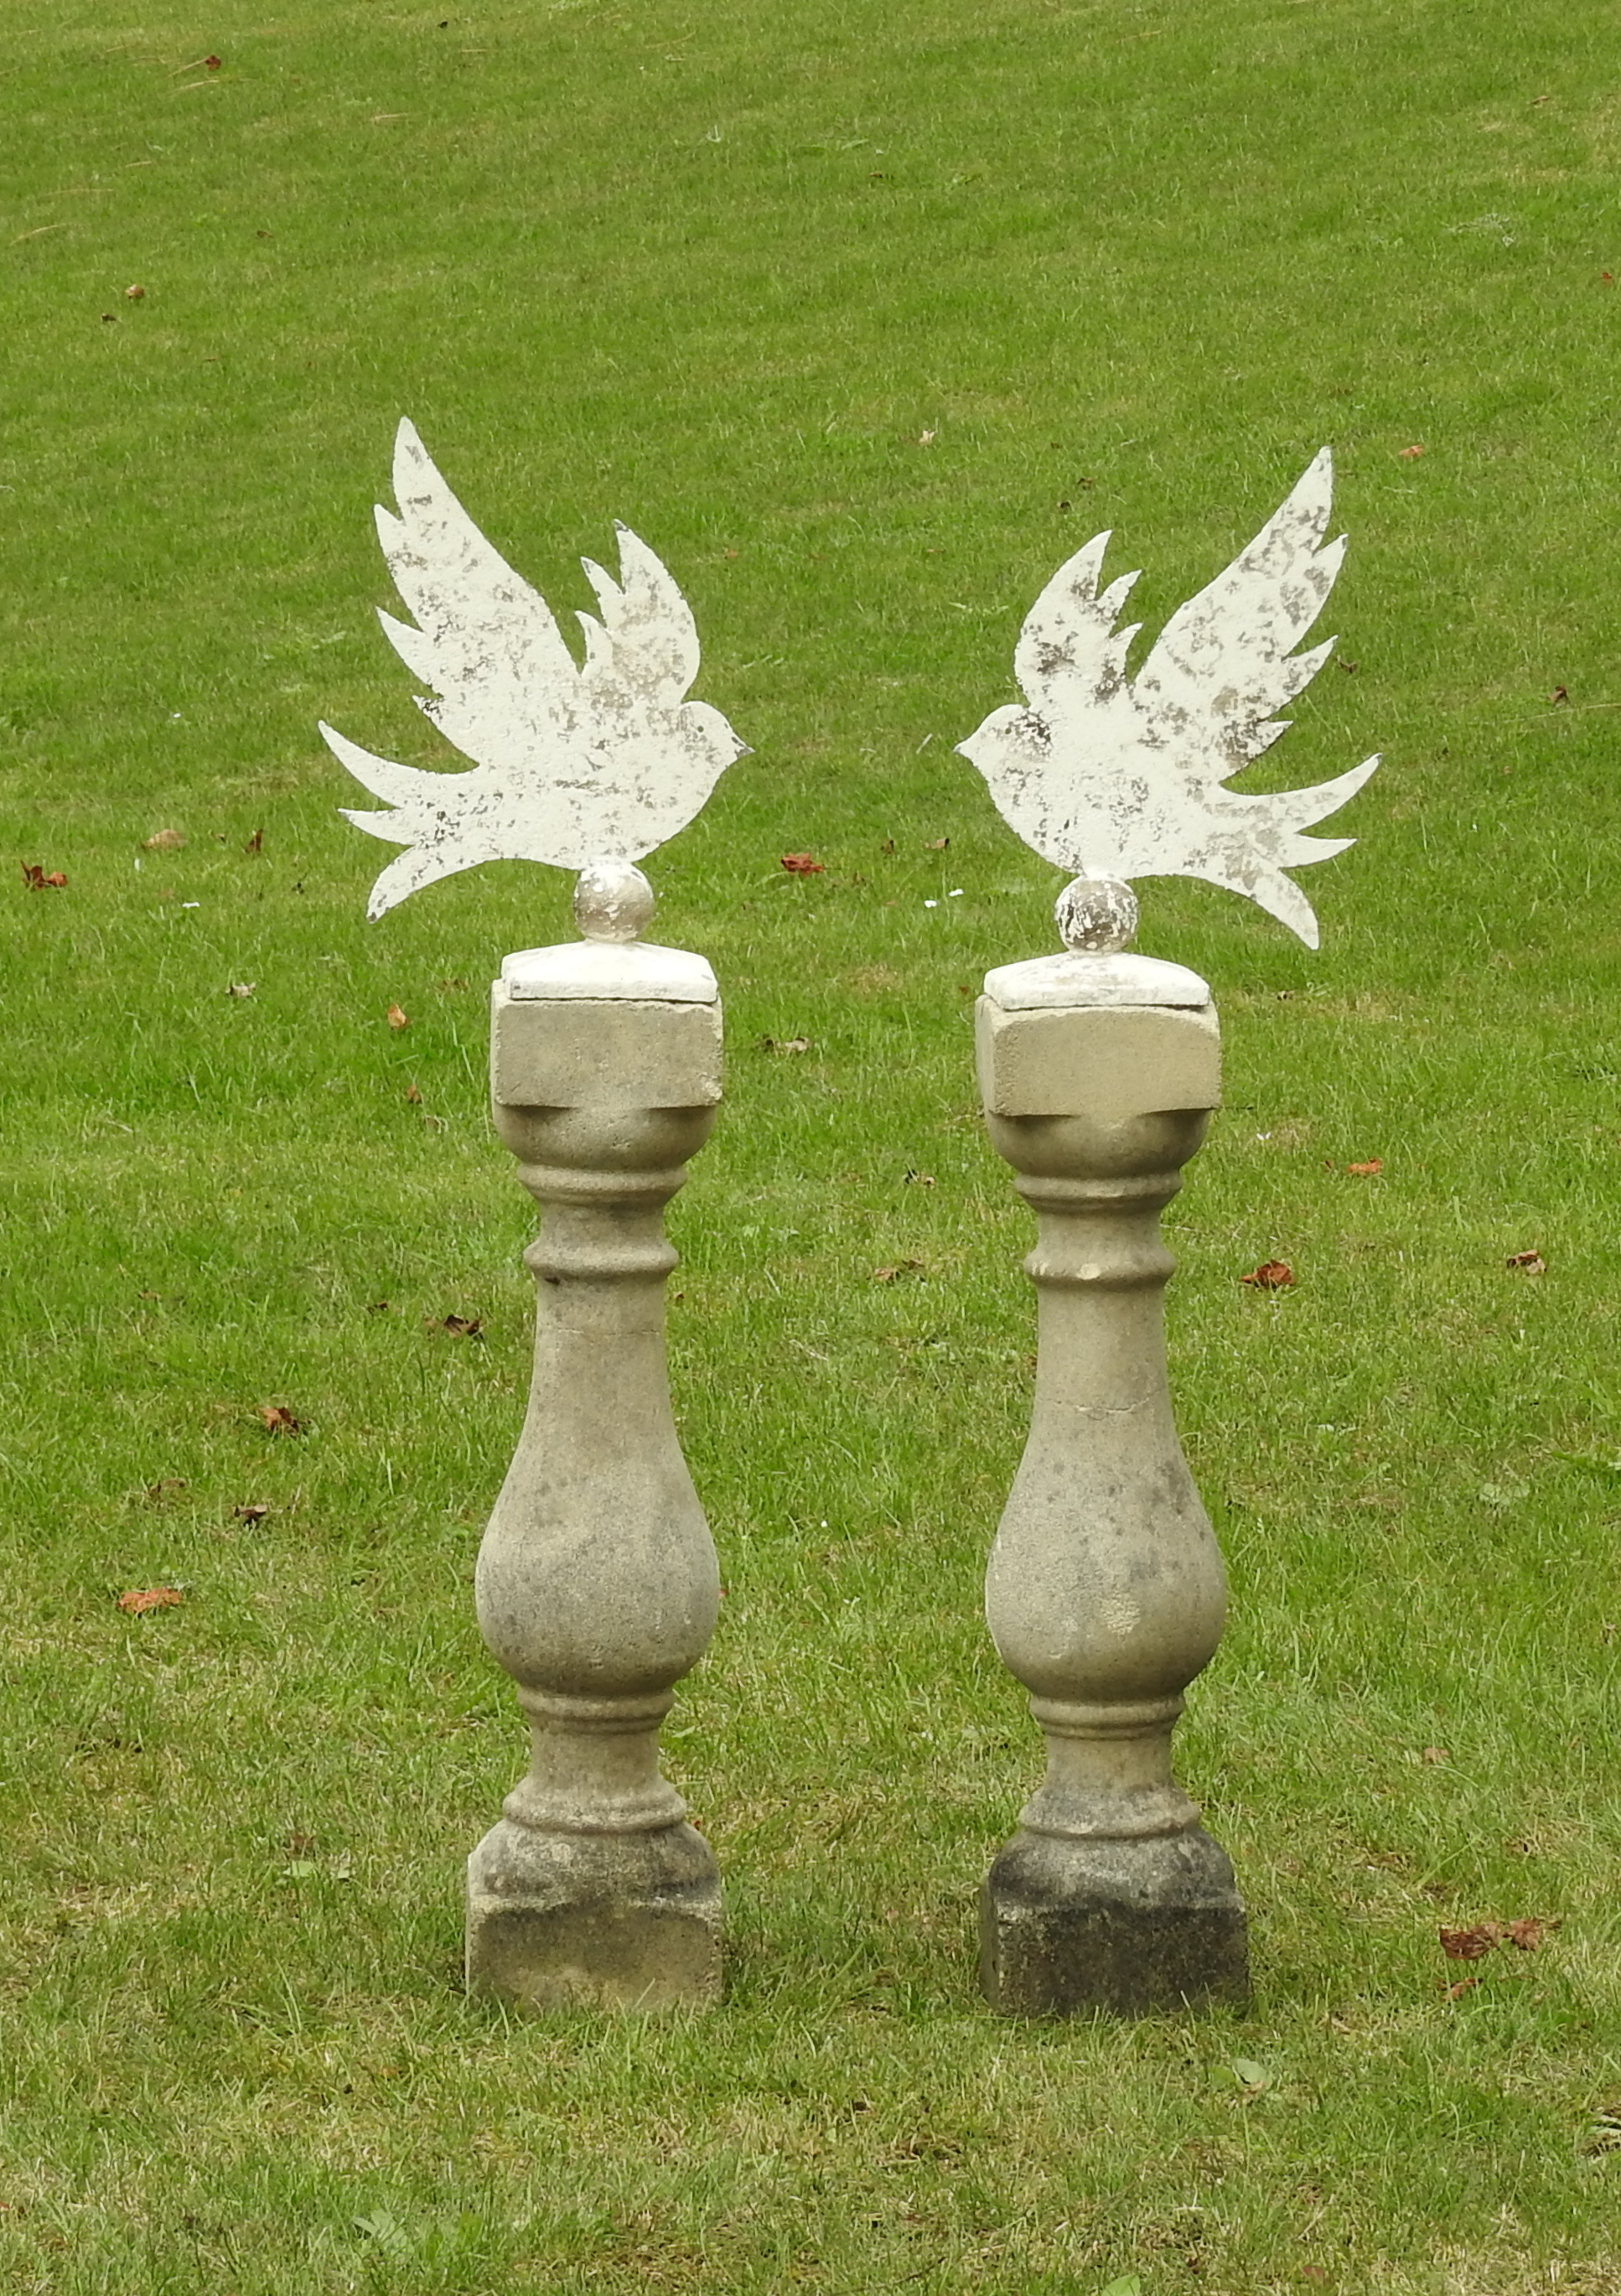 Doves - £80 - Medium: 30 x 21cmMini: 13 x 11cm